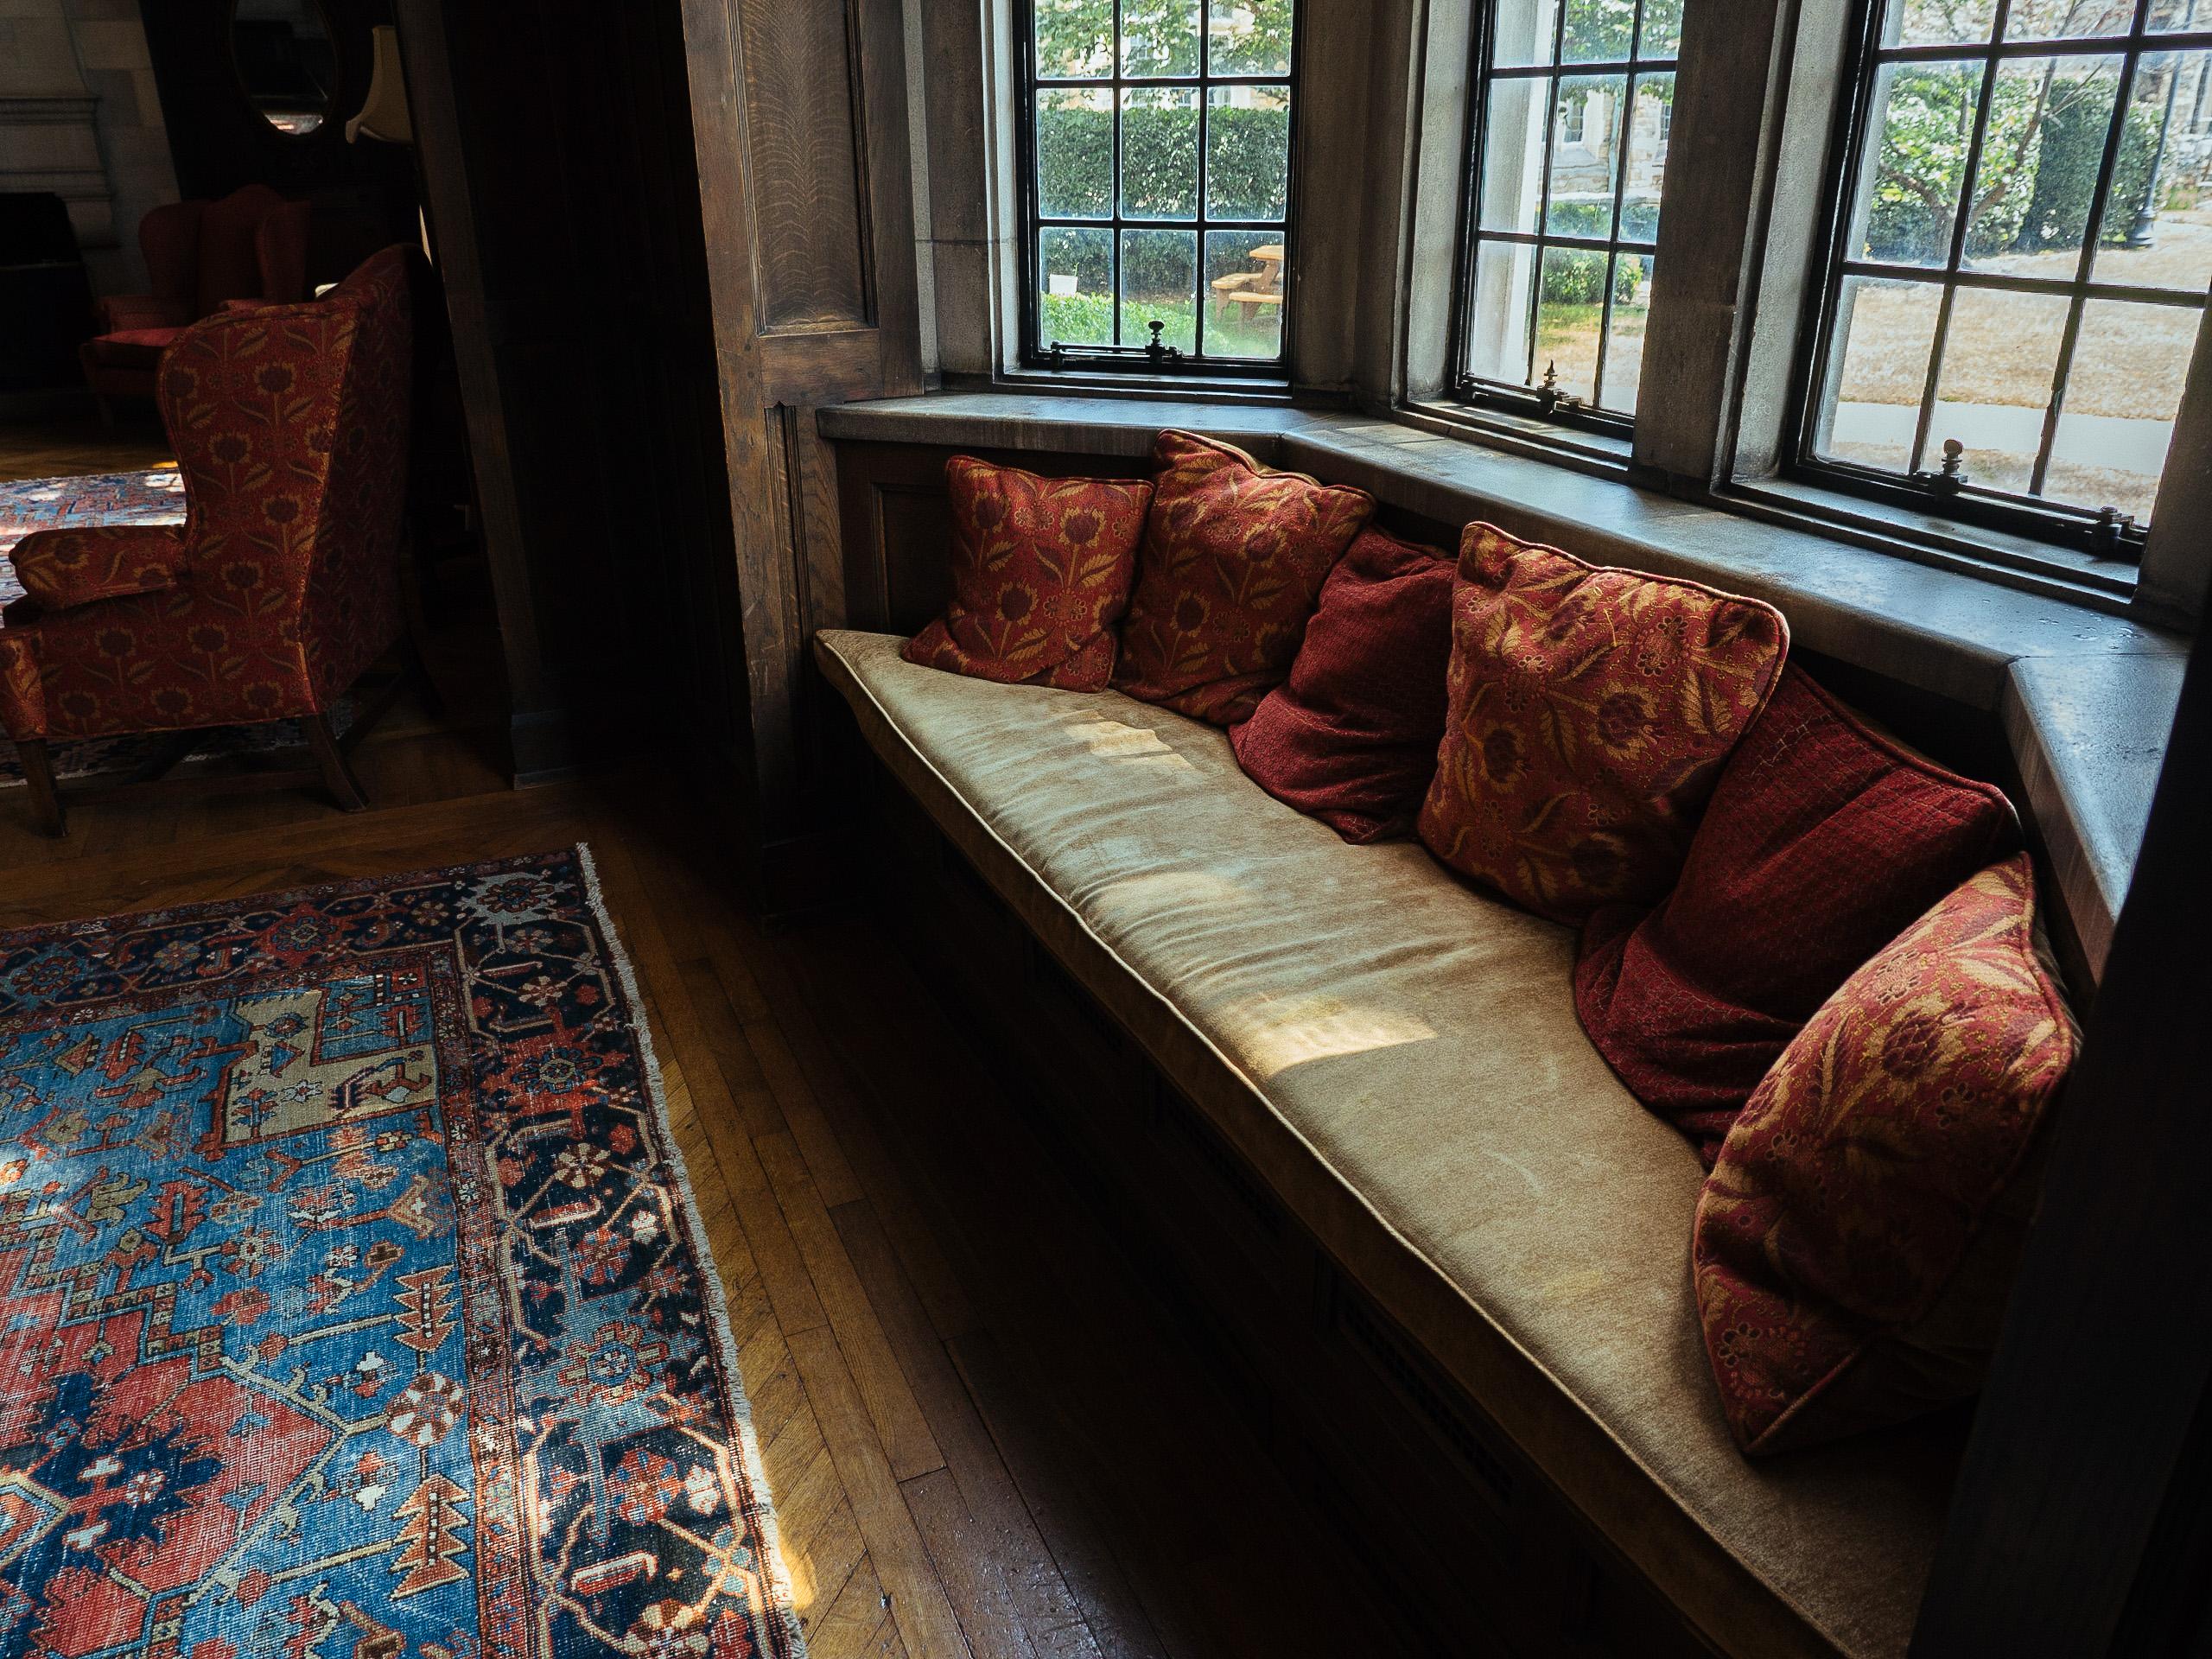 bay window with window seat and beautiful furniture